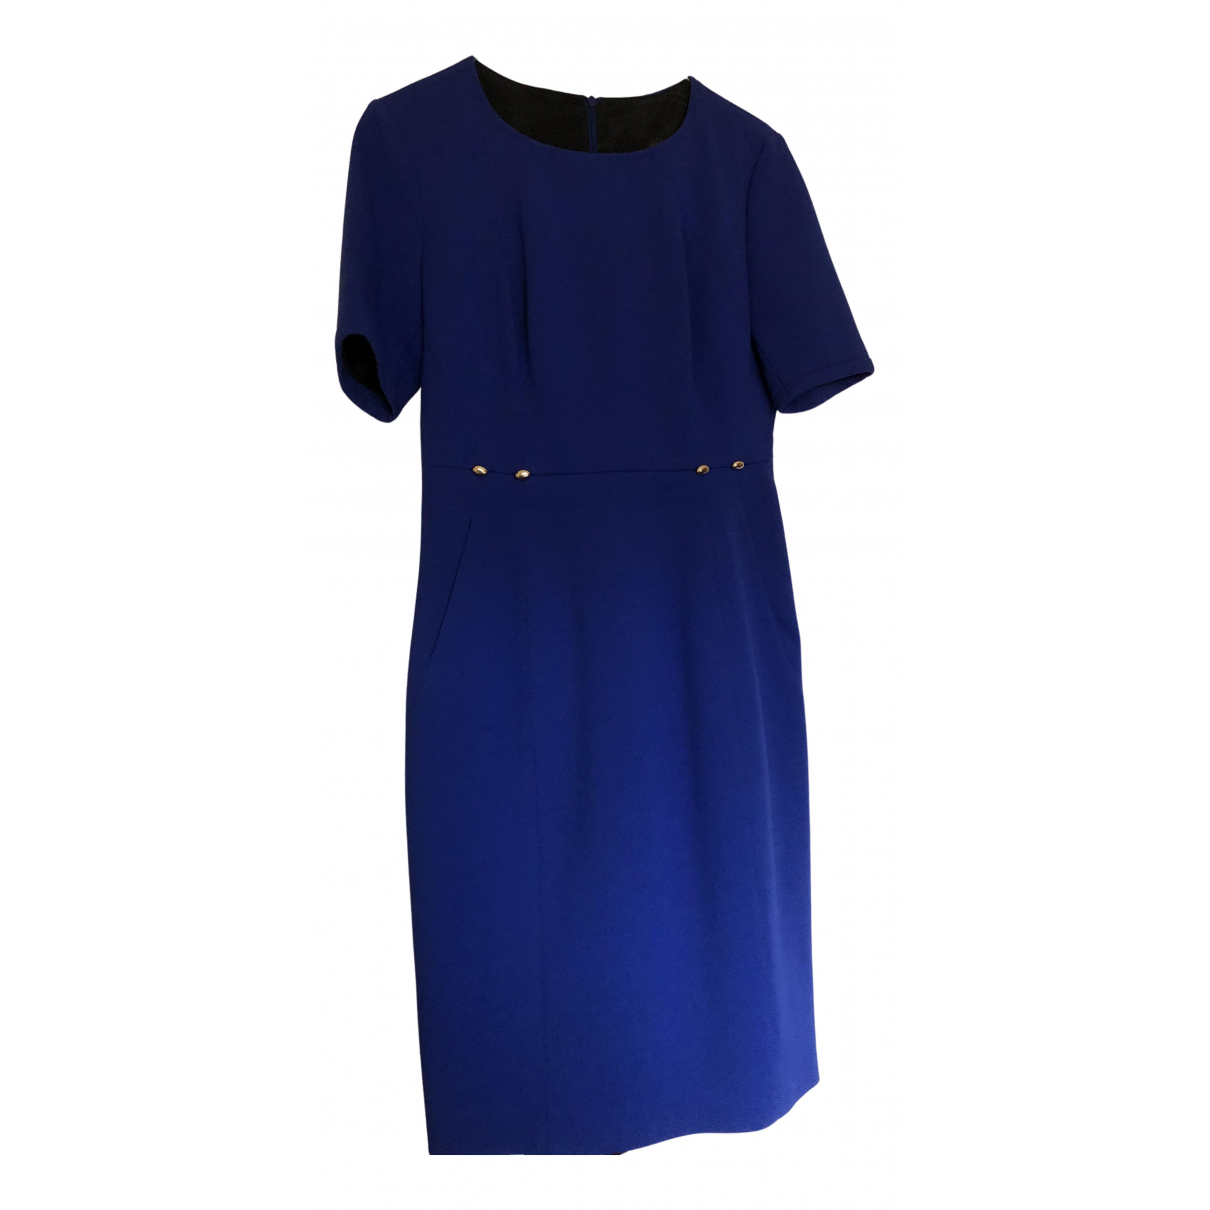 Adolfo Dominguez N Blue dress for Women 40 FR